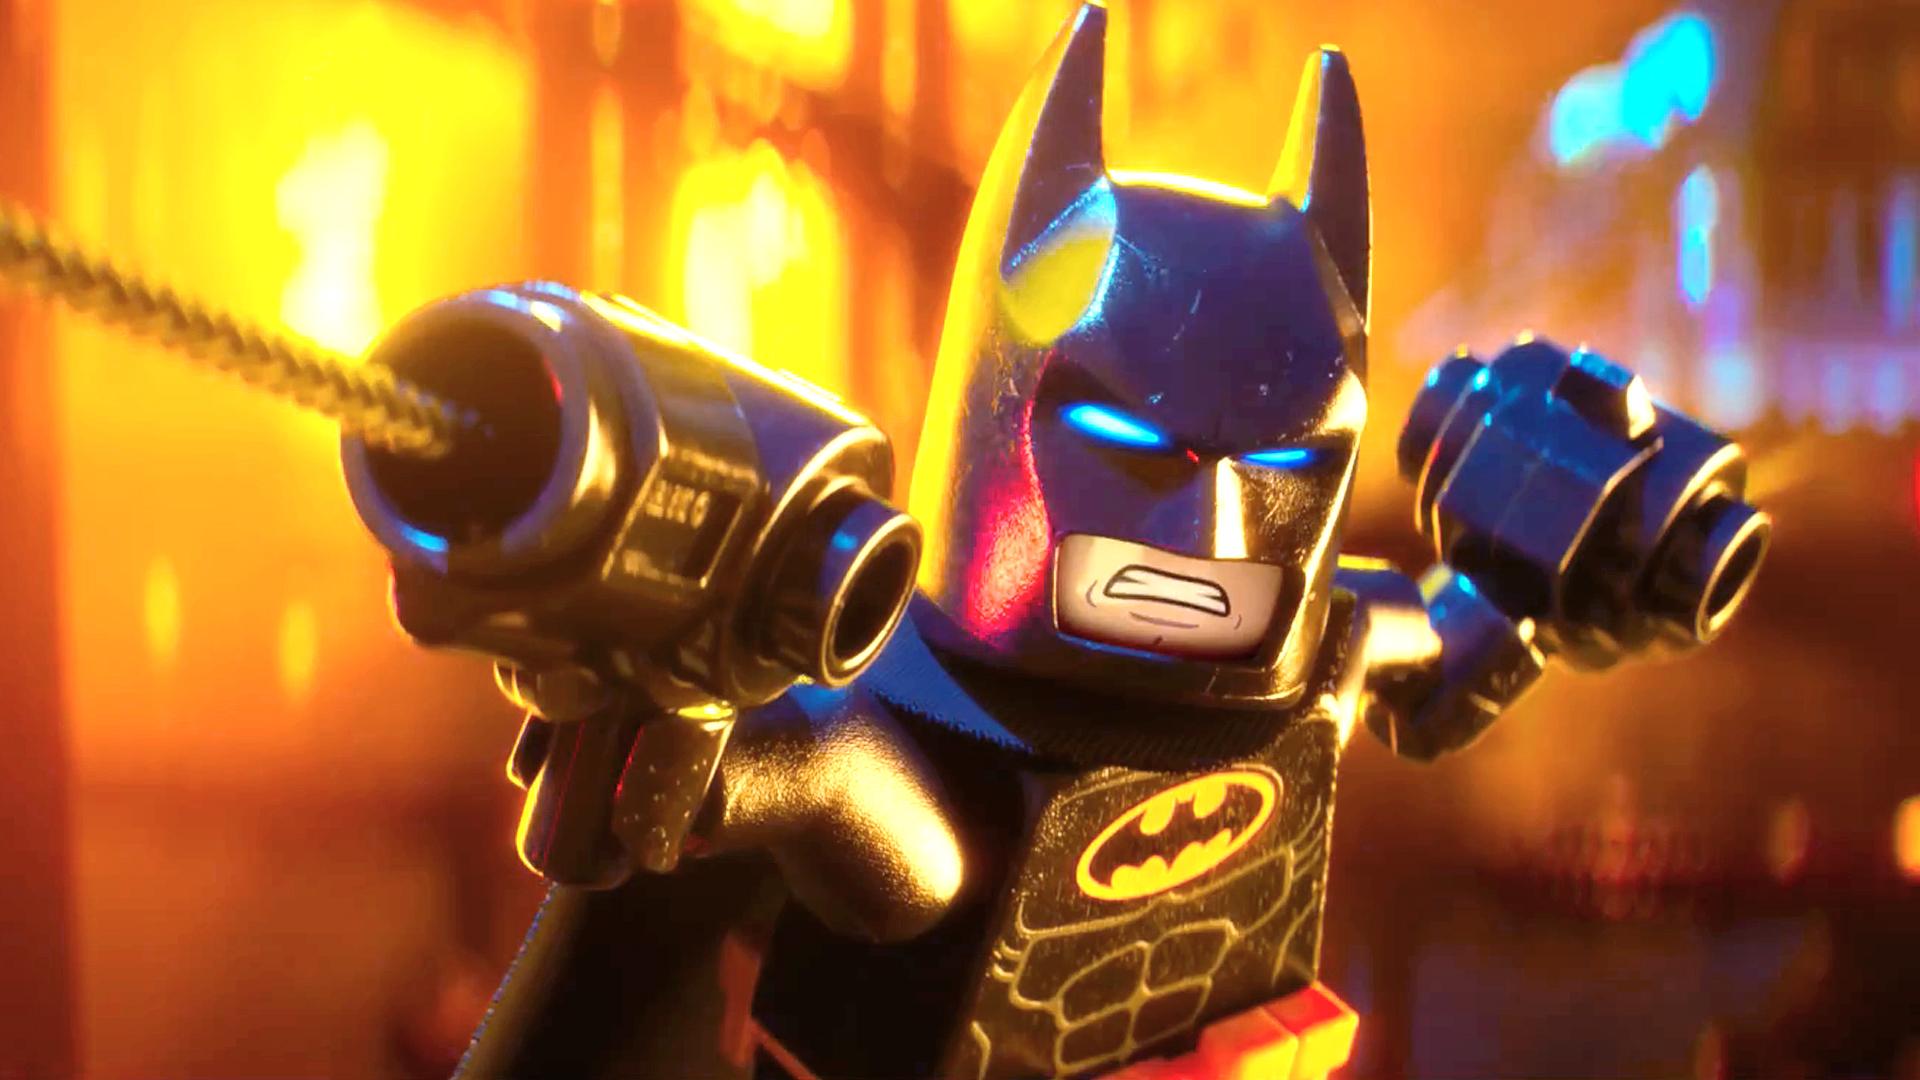 Every Batman animated film ranked